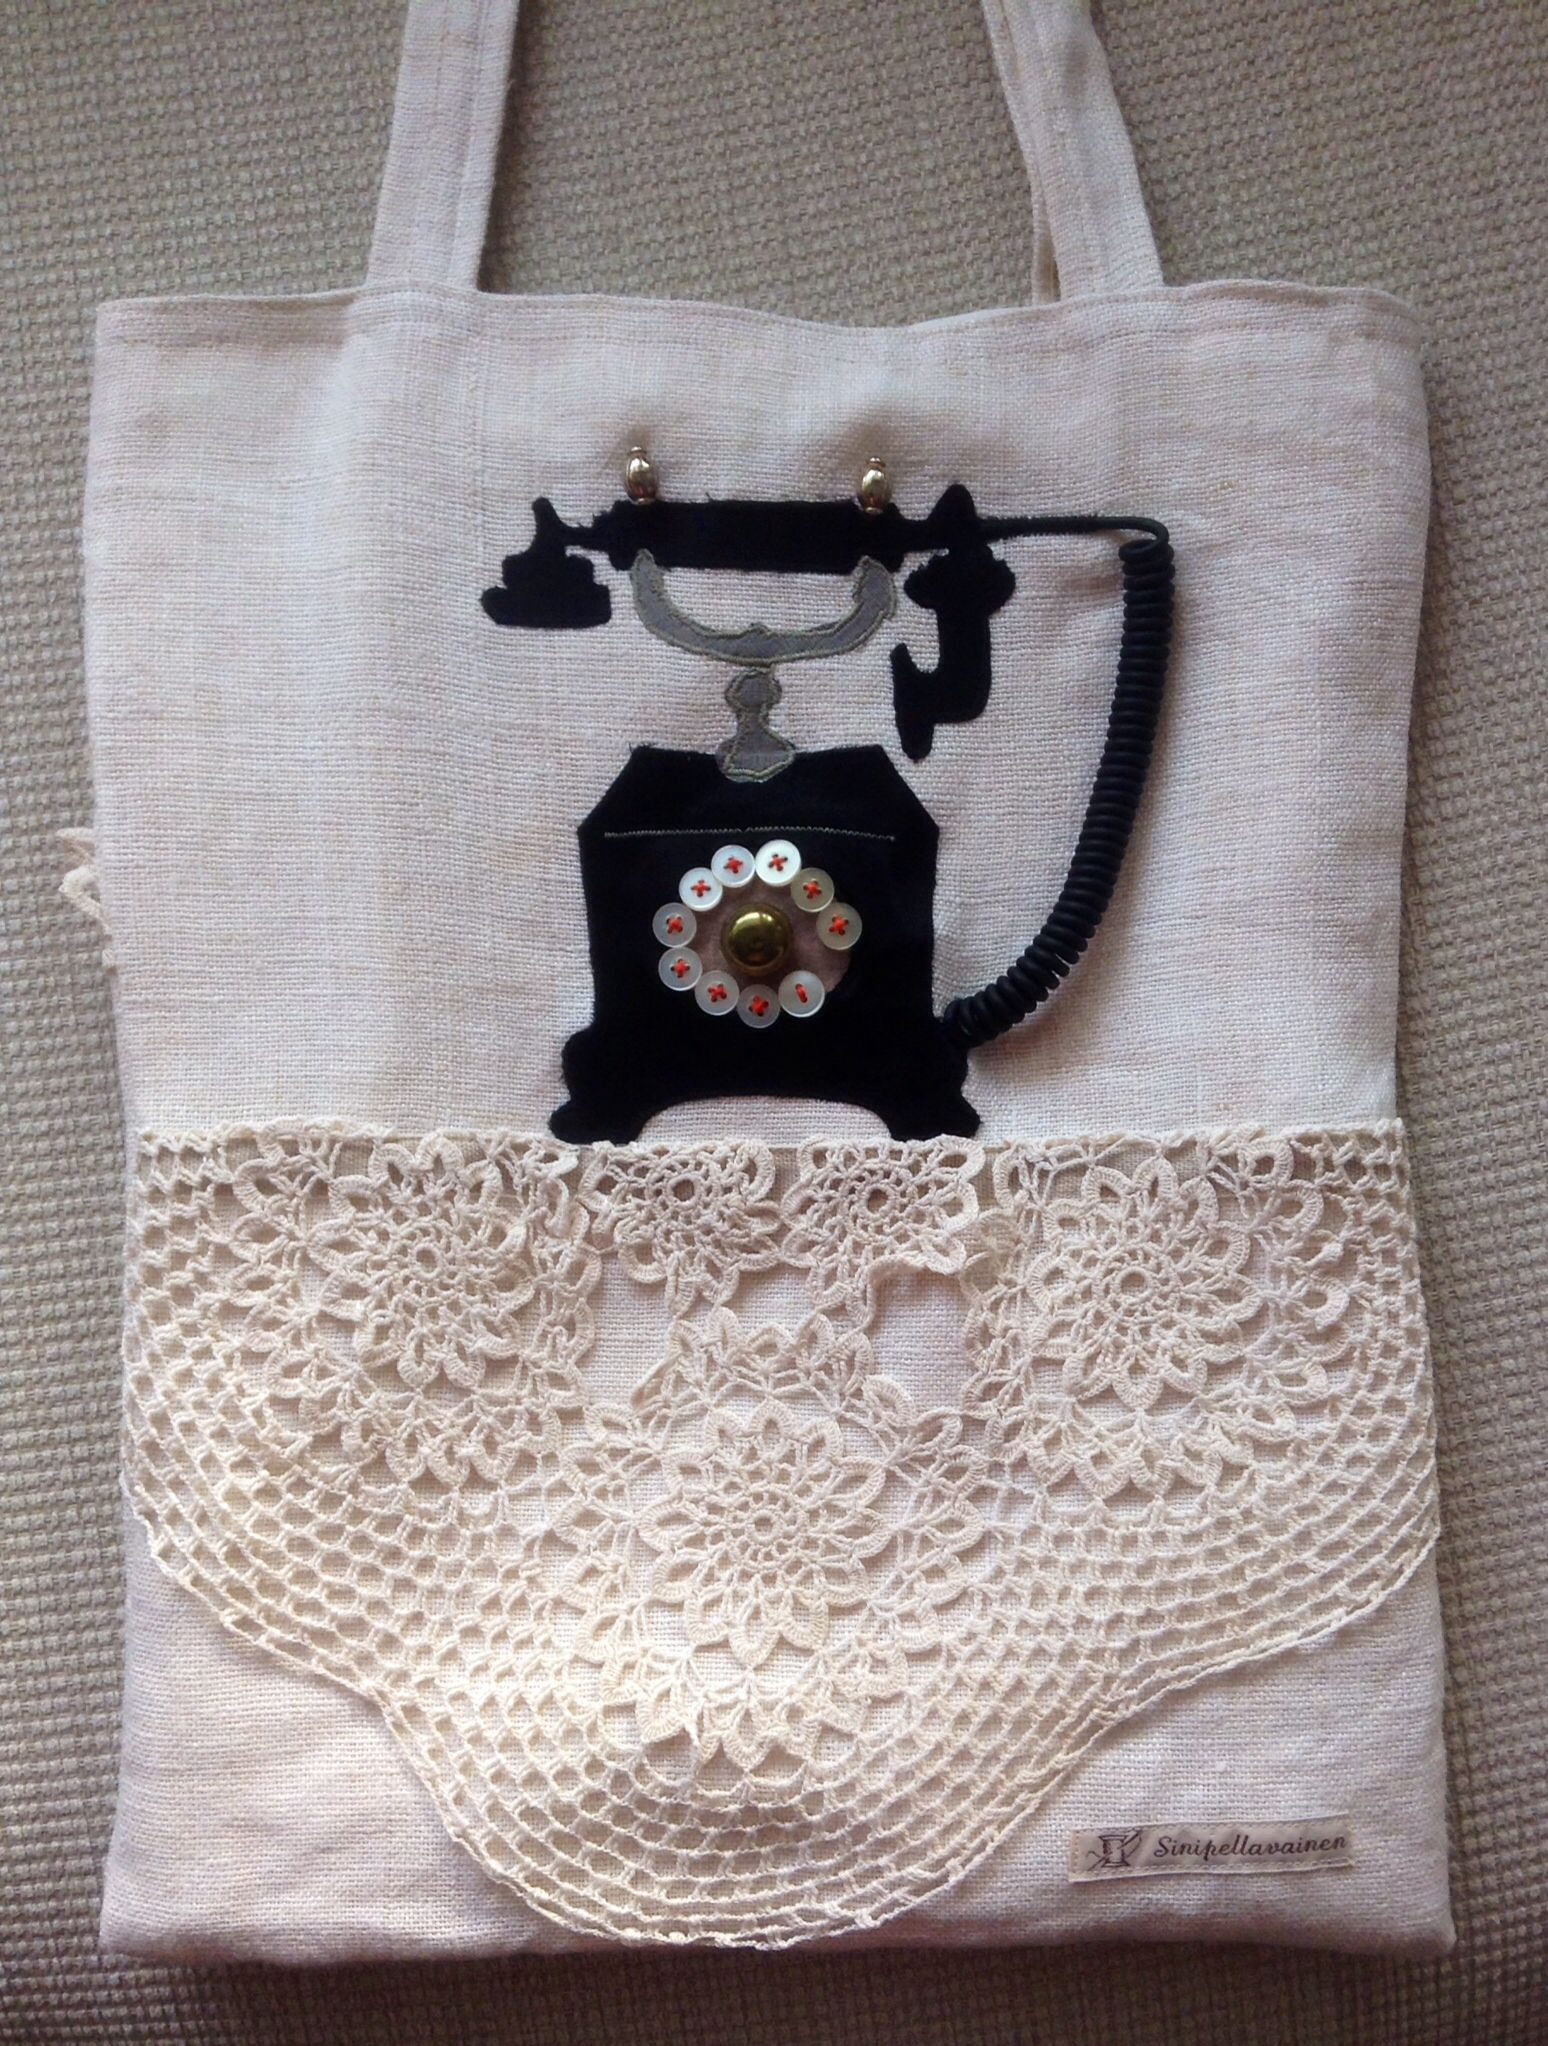 Telefooni-laukku prllavasta Design Sinipellavainen